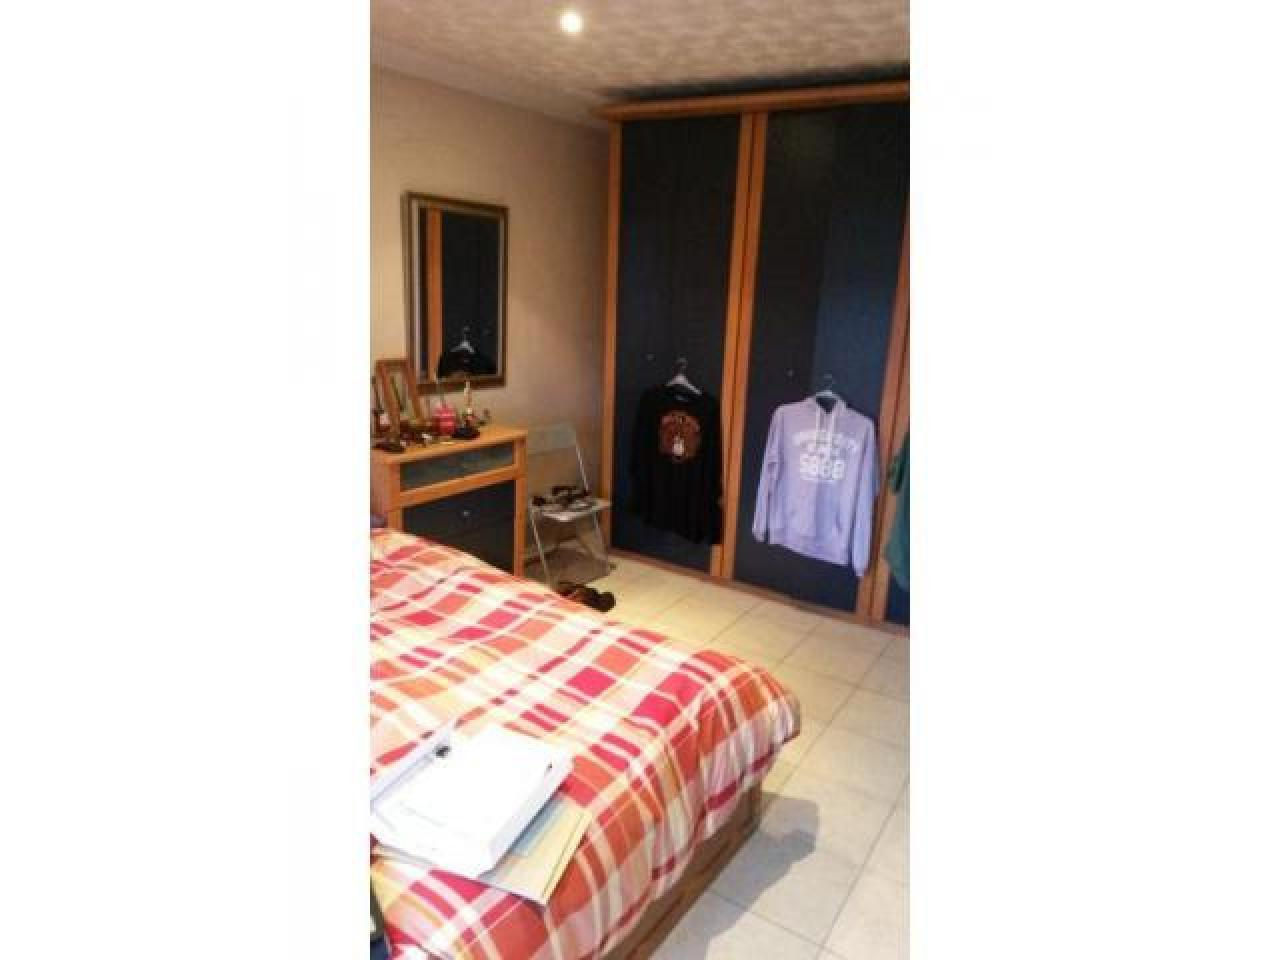 Сдаём 2-комнатную квартиру (one bedroom), Sougate, N14 (Лондон) - 1